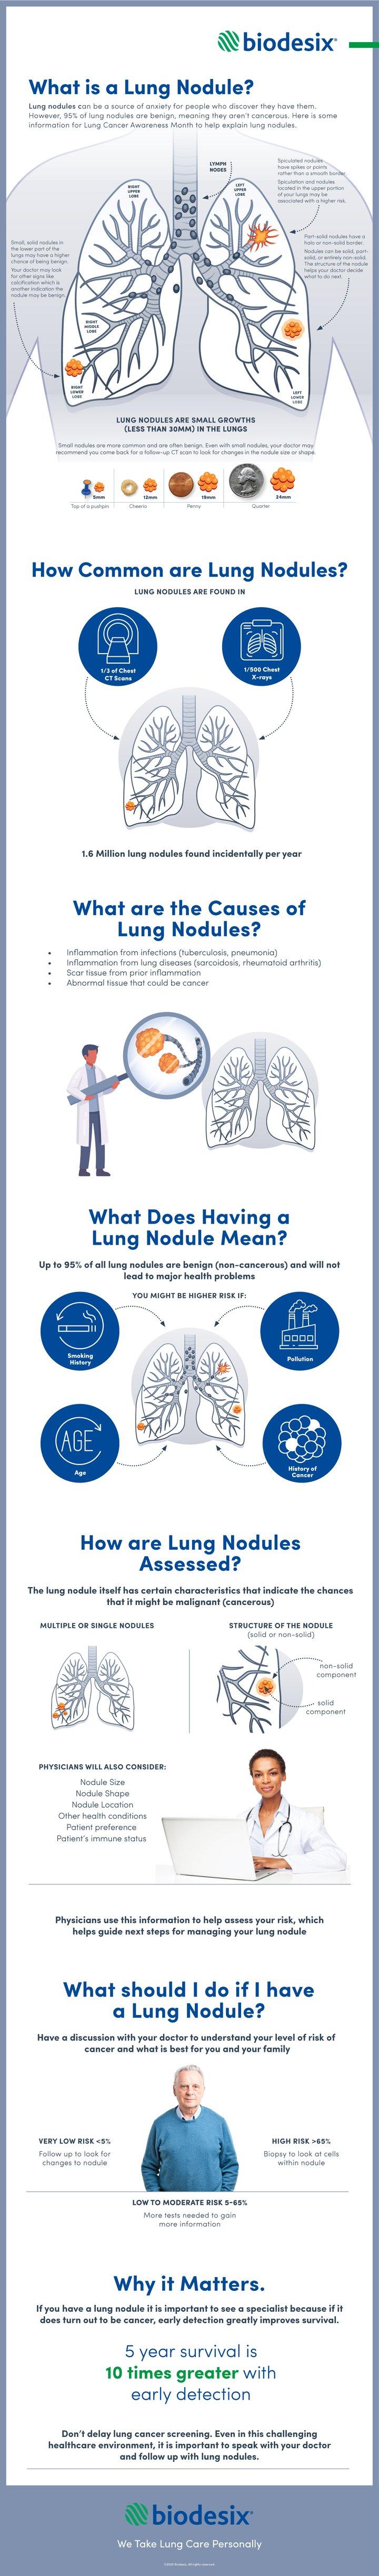 2020-Biodesix-Infographic-FINAL